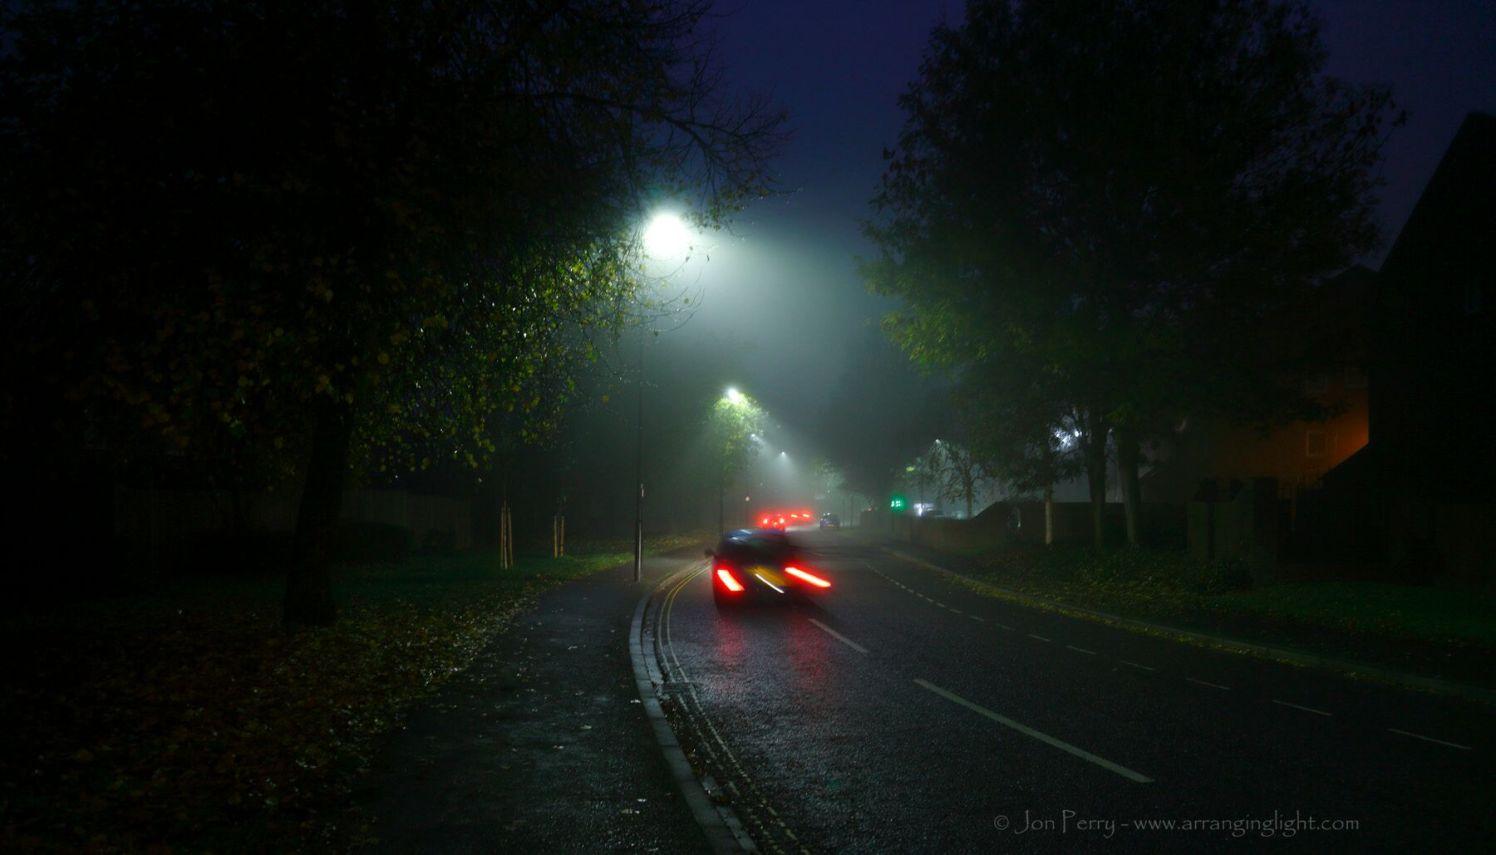 _C0A5034REWS Under the Lights, Jon Perry - Enlightenshade, 2-11-15+ zaq